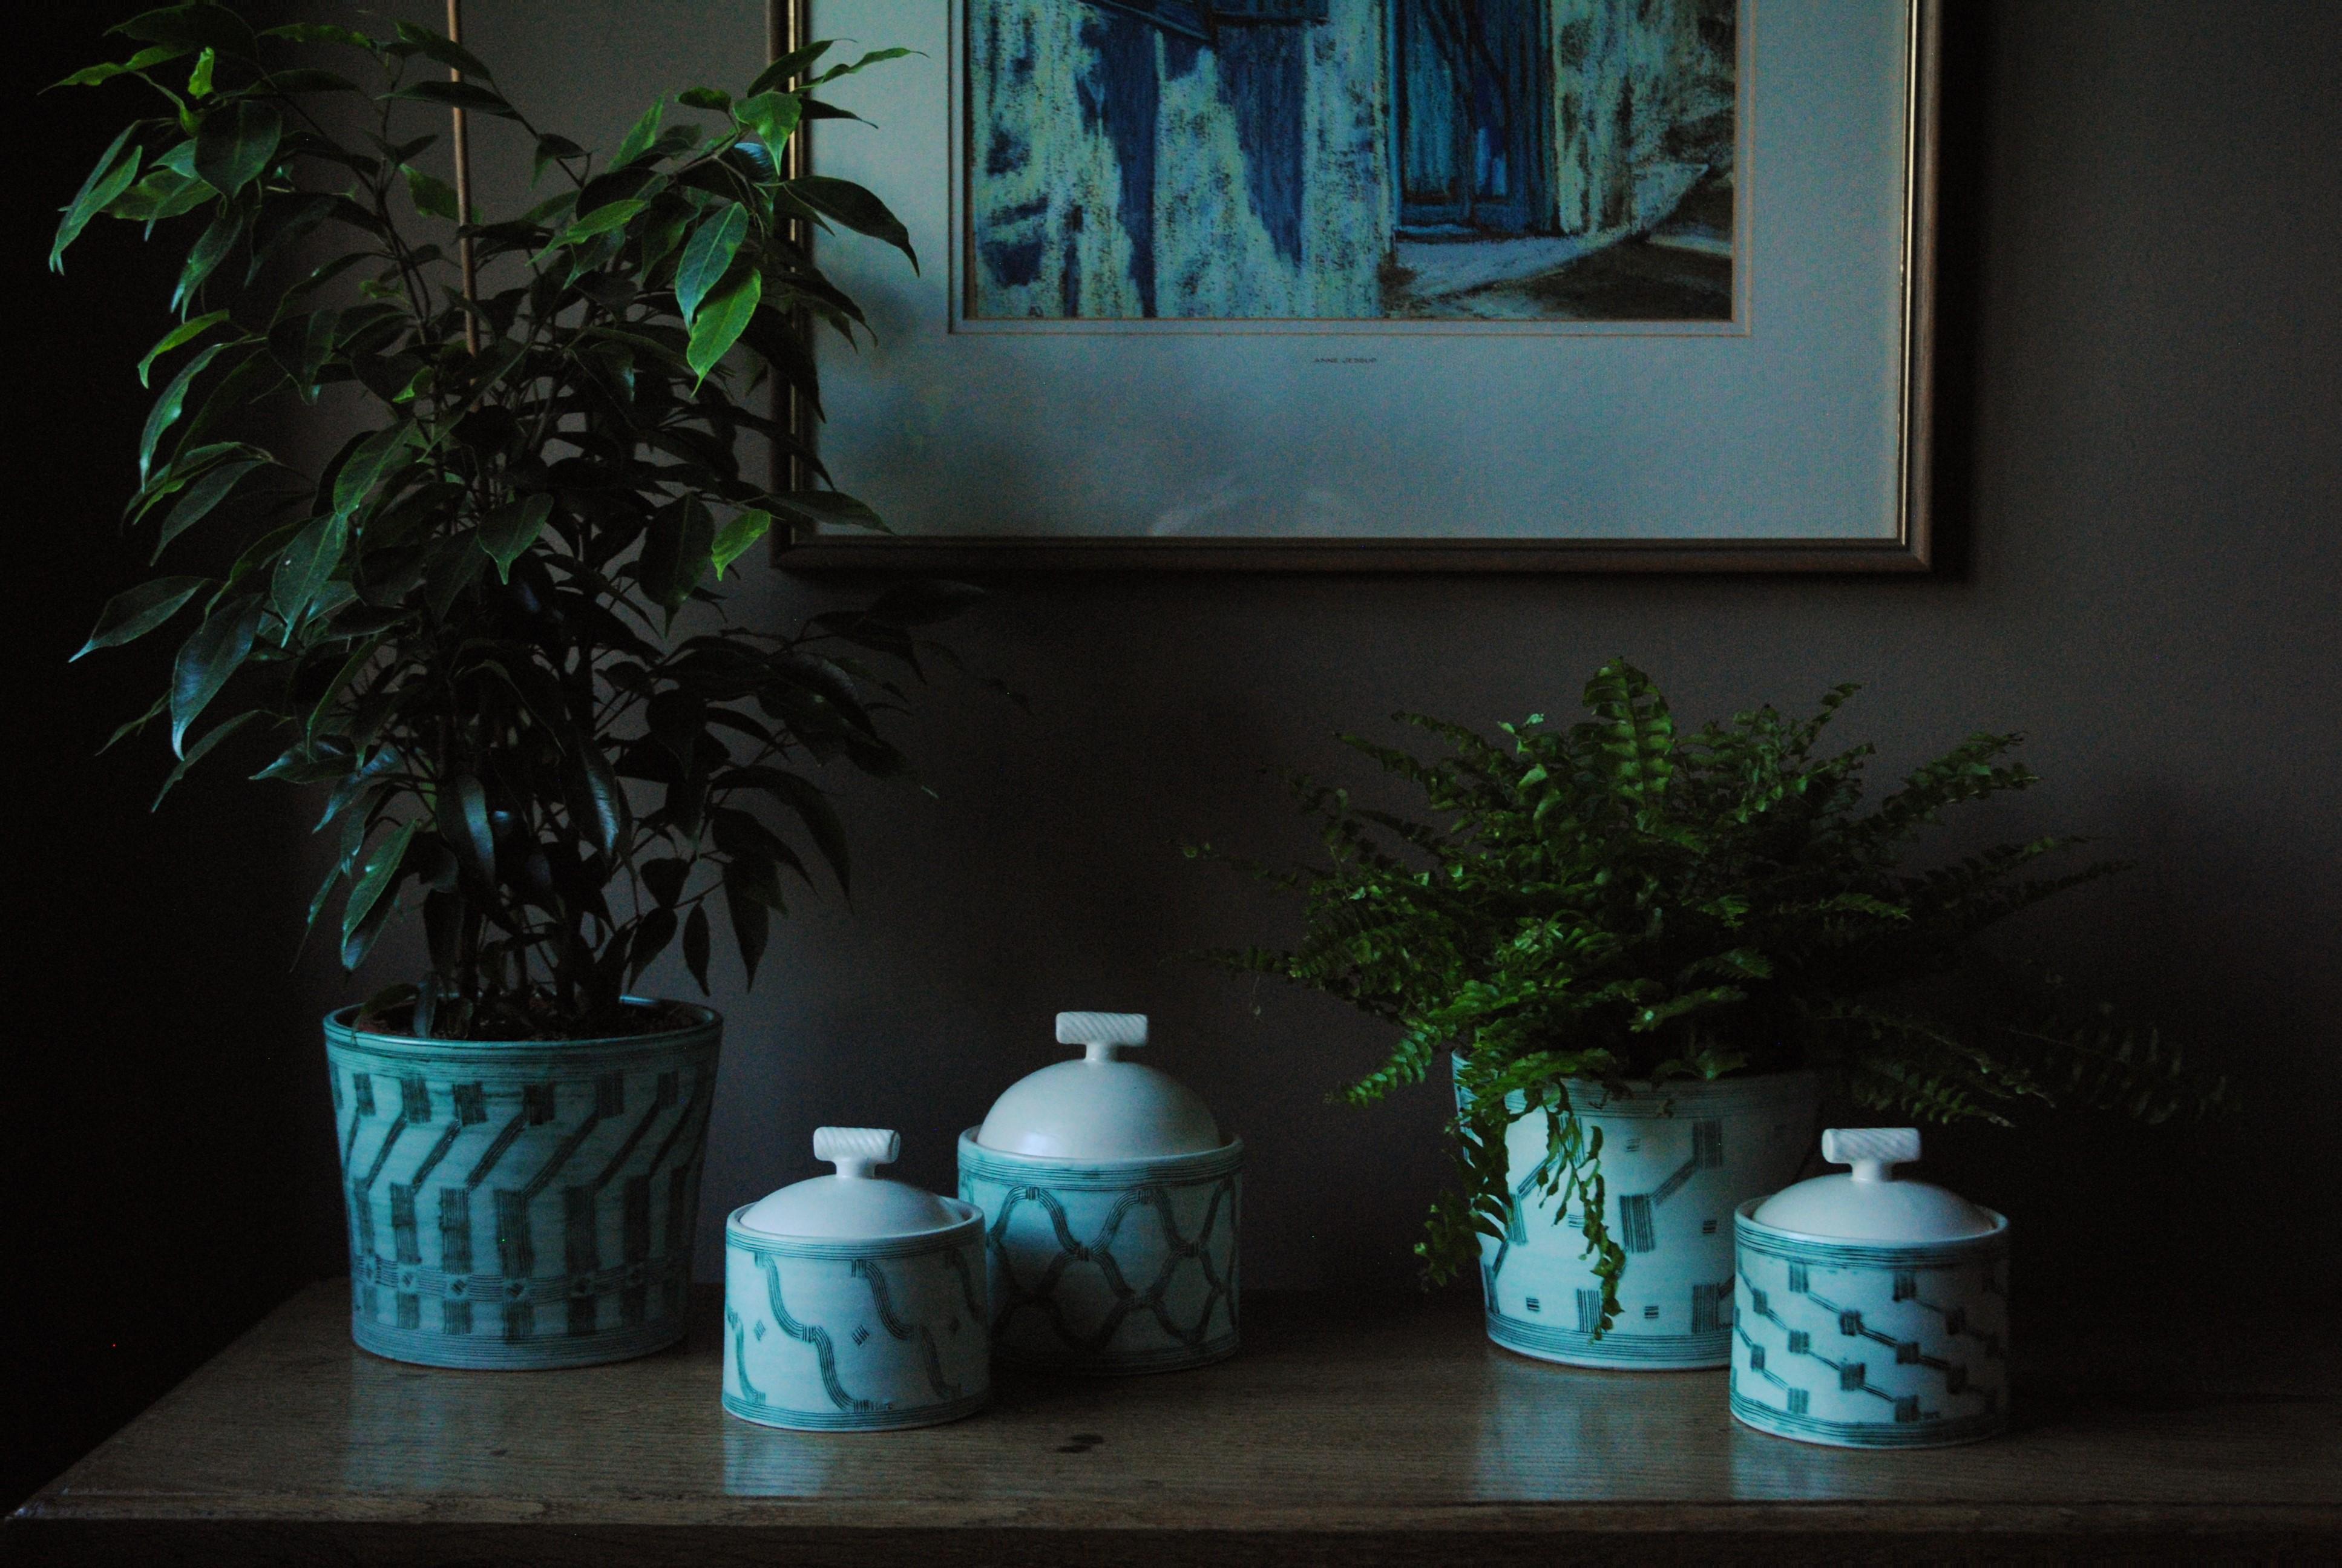 Lidded pots and cache pots